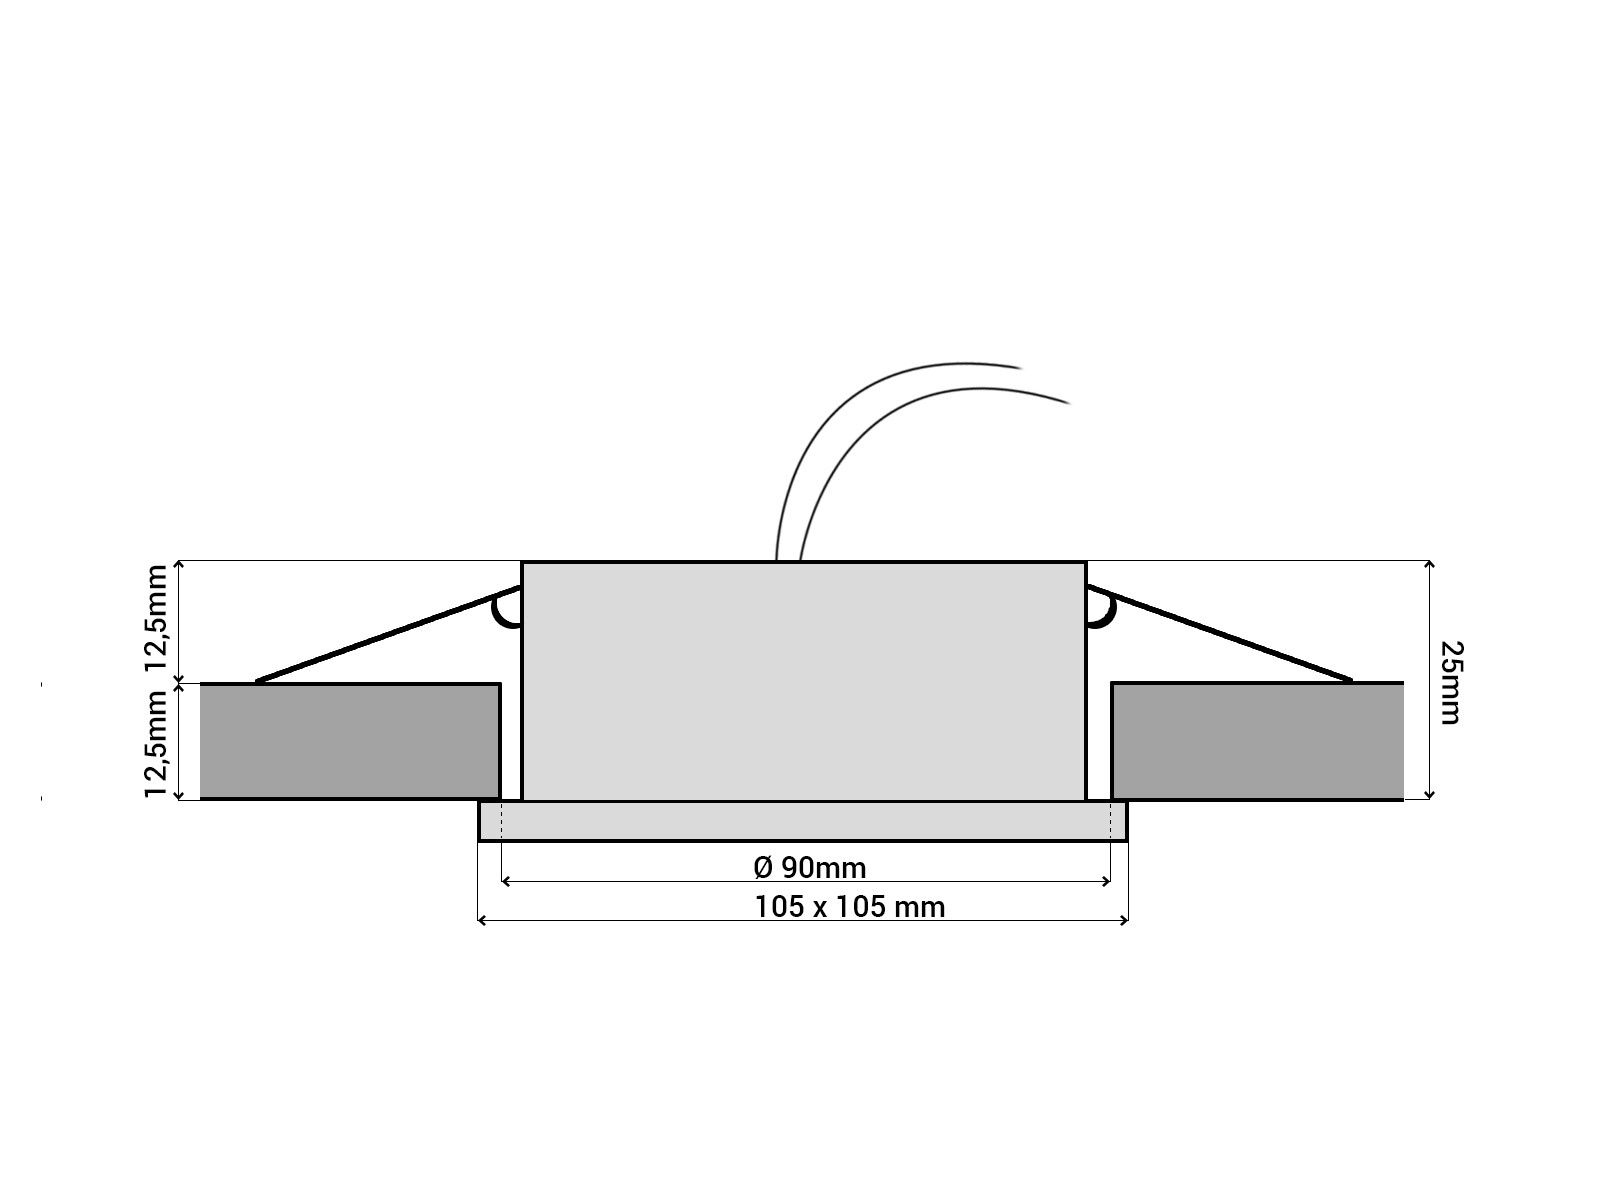 rx 4 alu led einbauleuchte quadratisch geringe einbautiefe. Black Bedroom Furniture Sets. Home Design Ideas